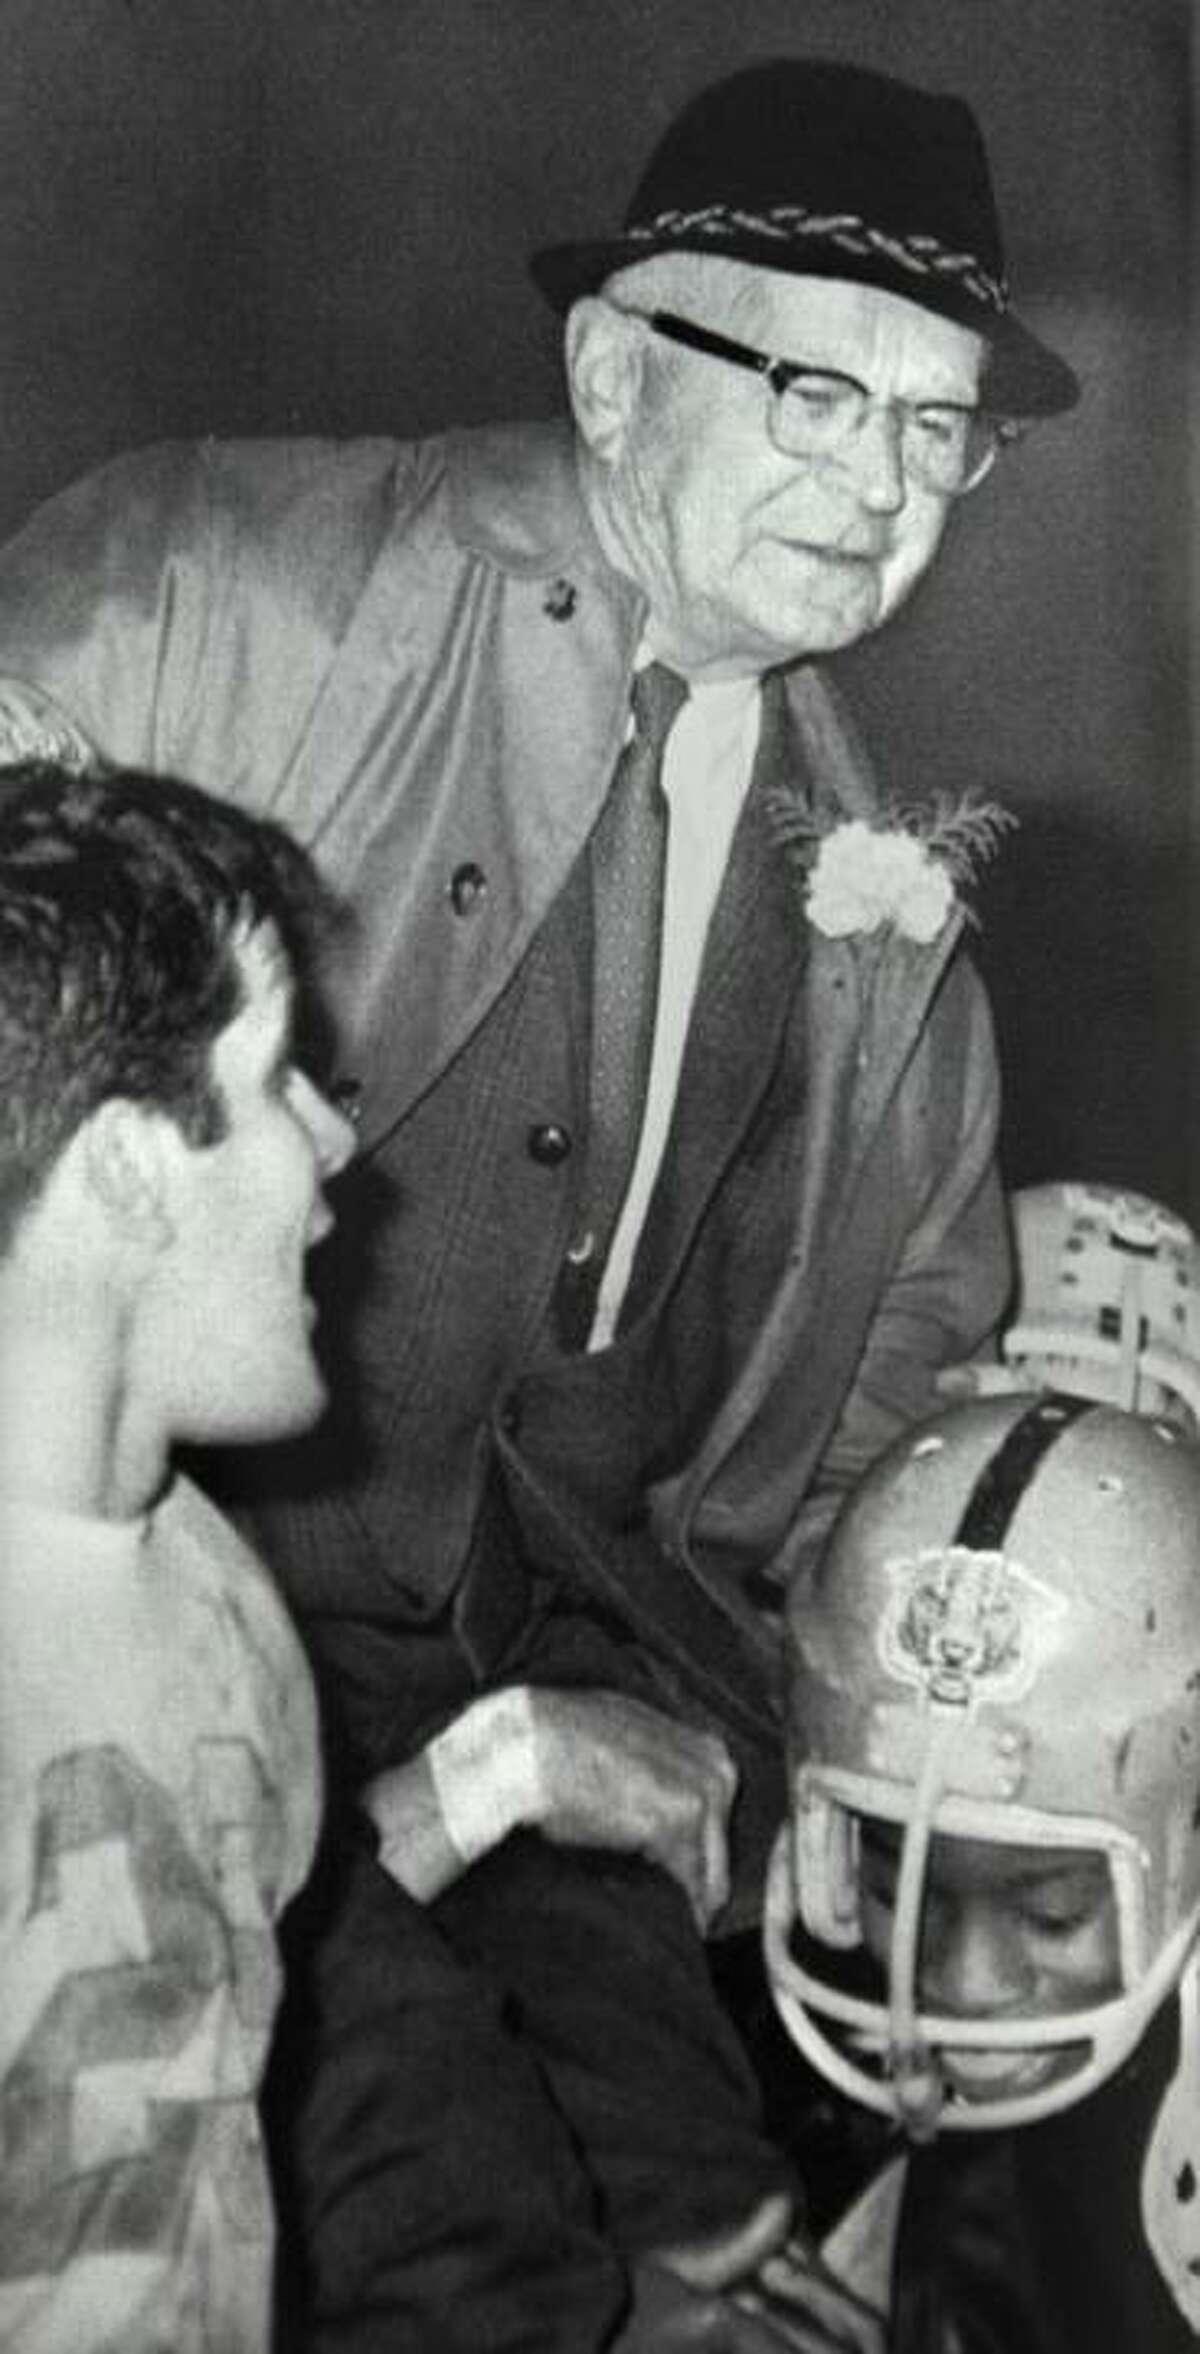 Courtesy Middletown High School 1967 Cauldron An undefeated season, Middletown High School Tigers head coach Waino Fillback. Ed Dzialo is at left.